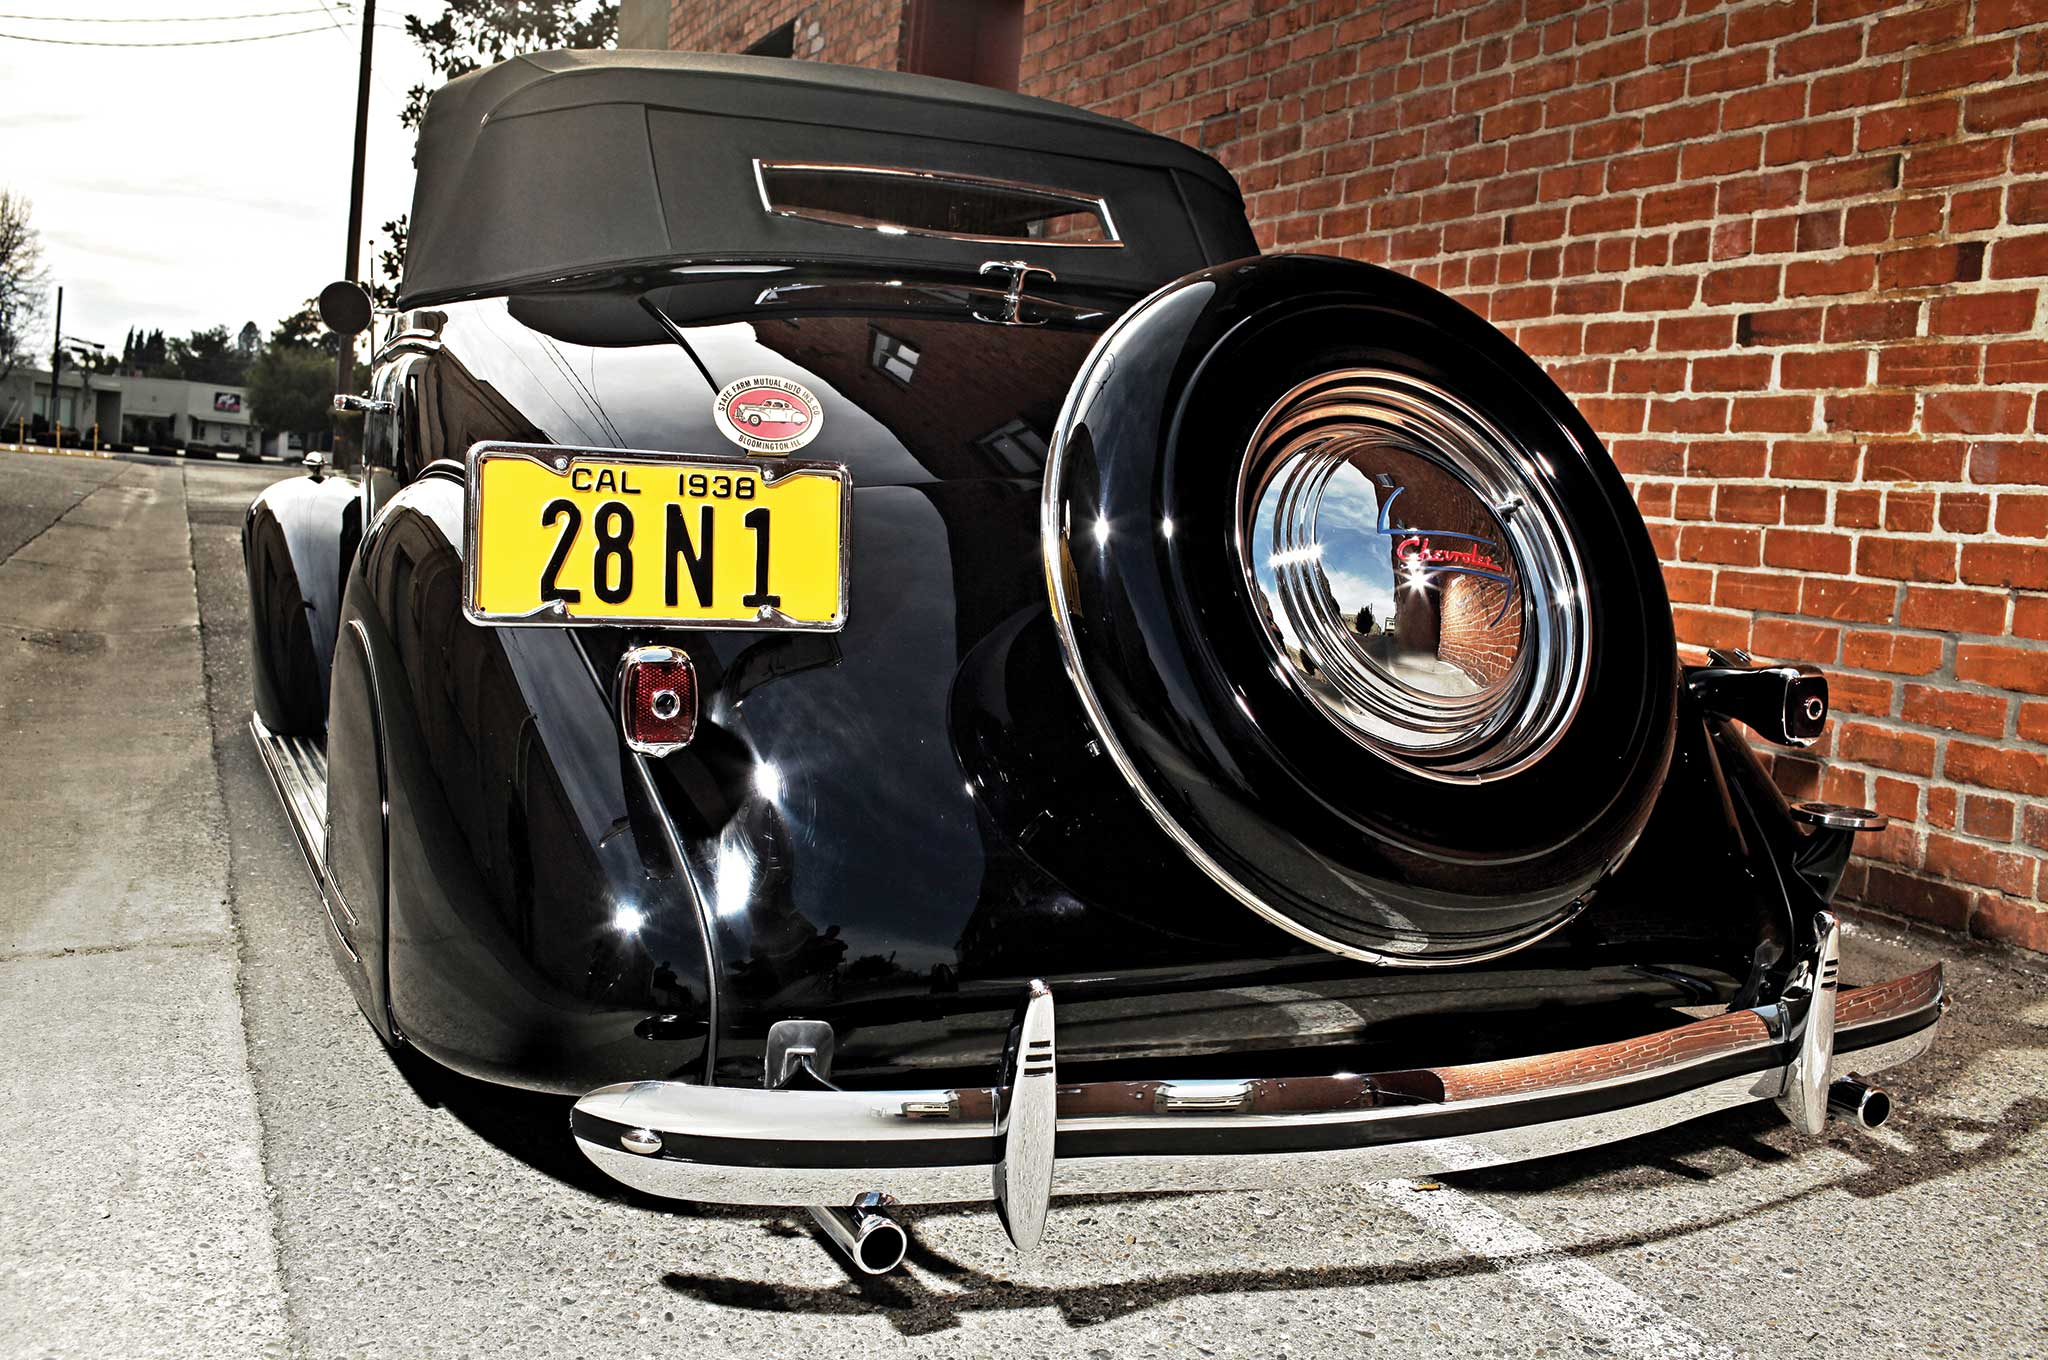 012 1938 chevrolet cabriolet spare tire